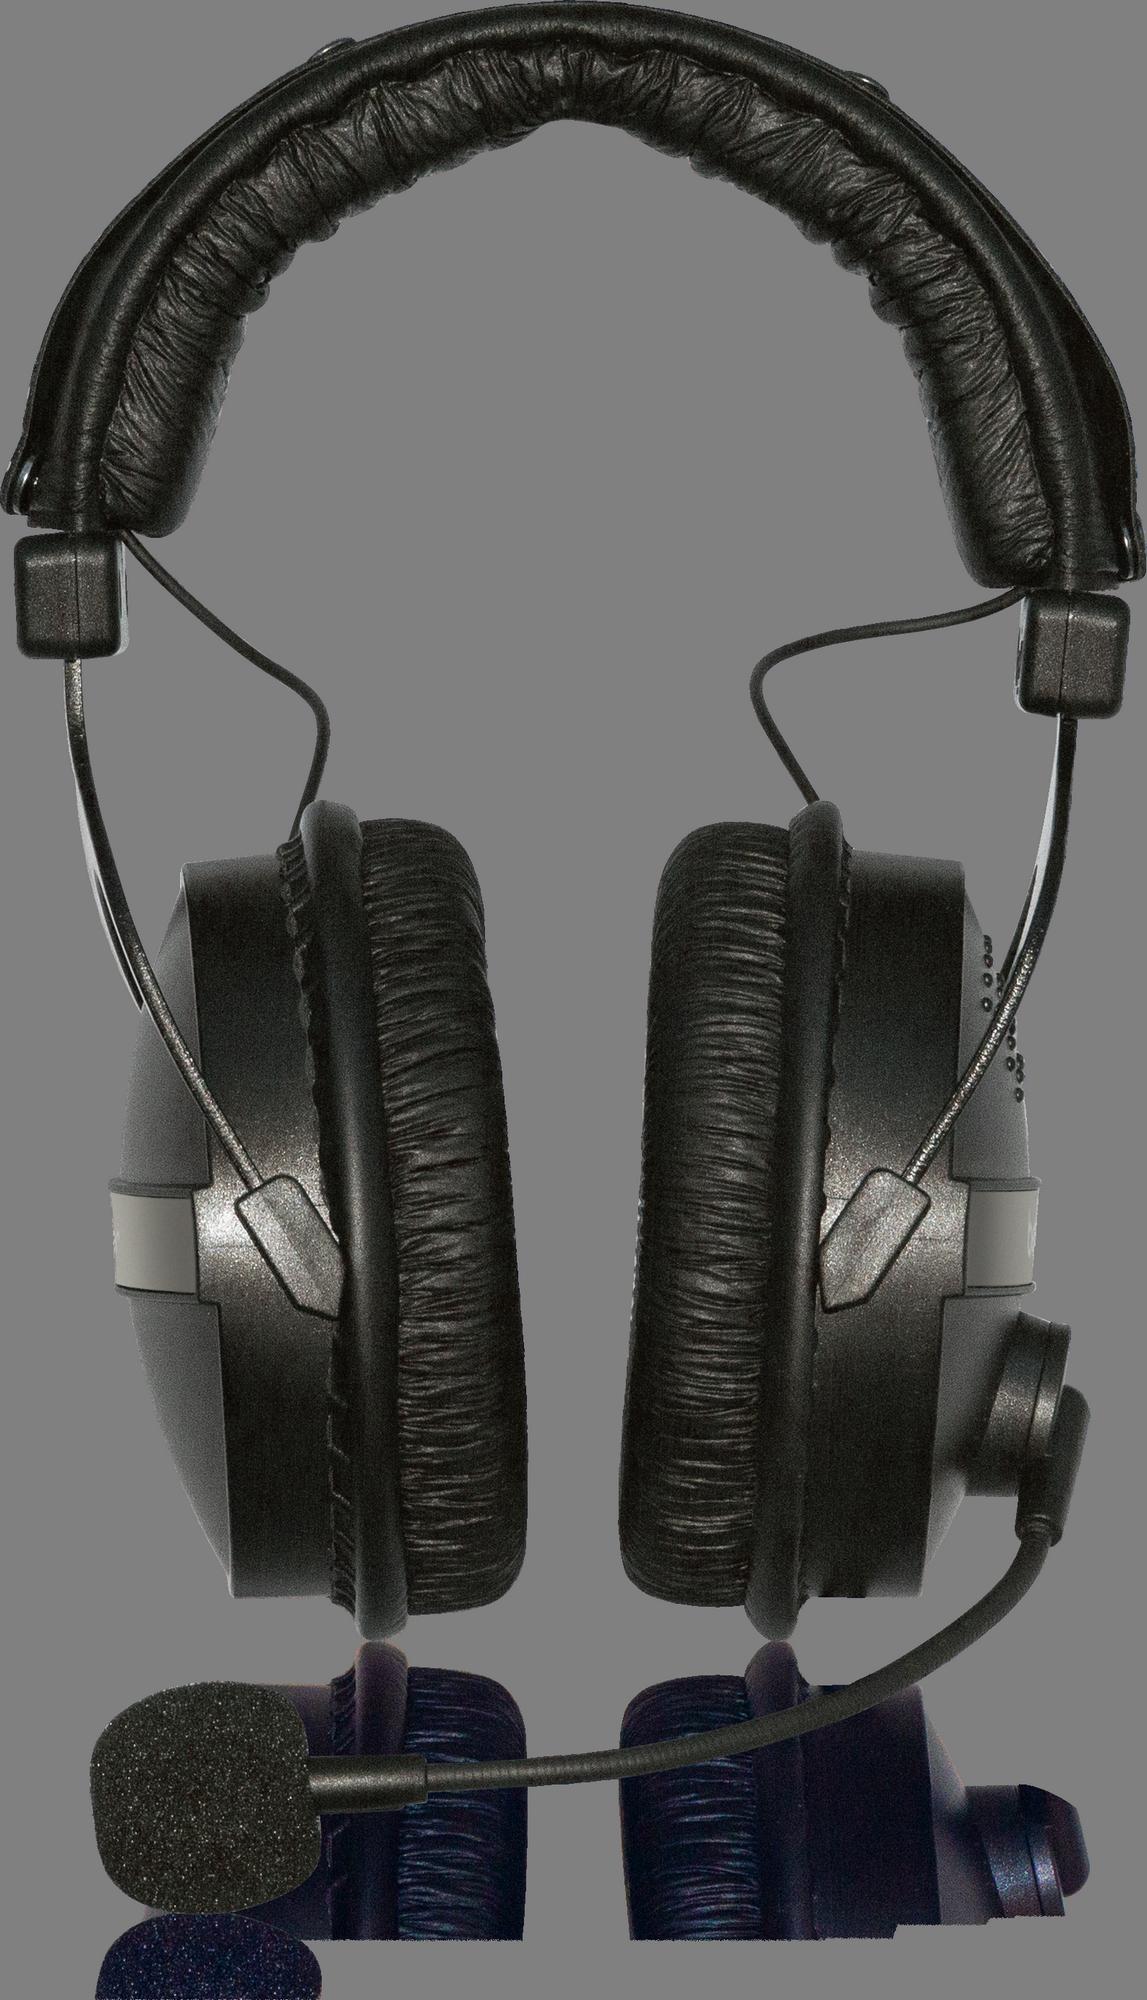 Behringer HLC 660M - Hoofdtelefoon